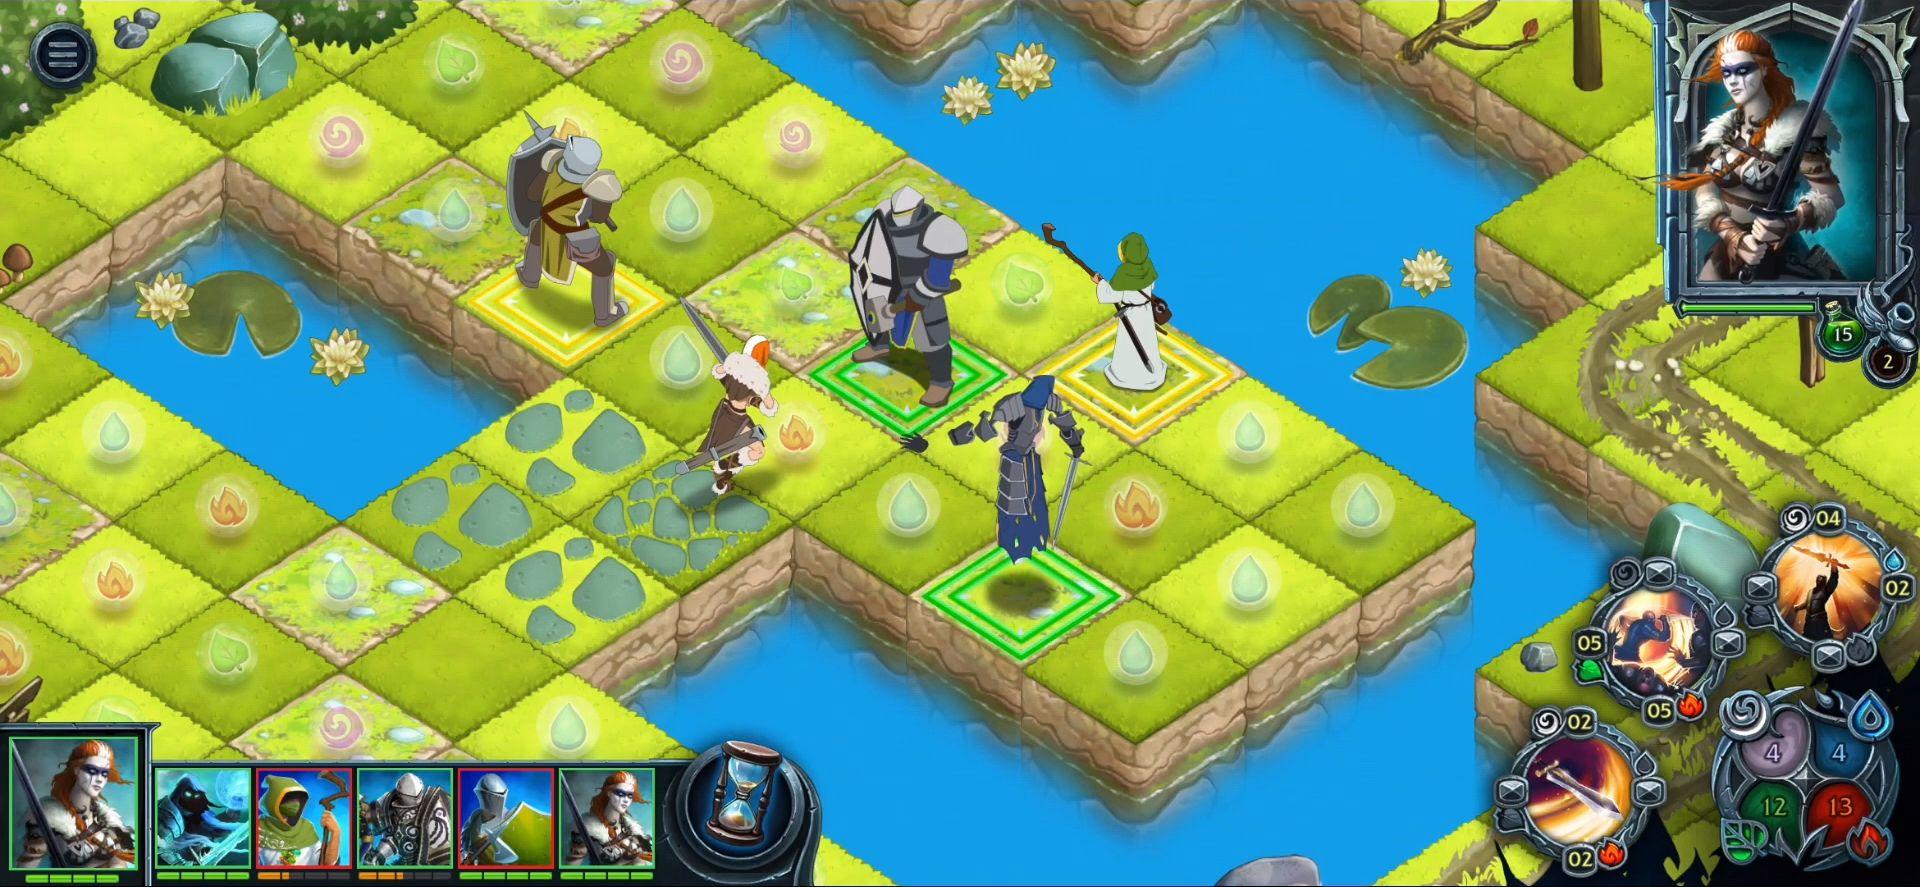 Heroes of War Magic.  Turn-based strategy capture d'écran 1